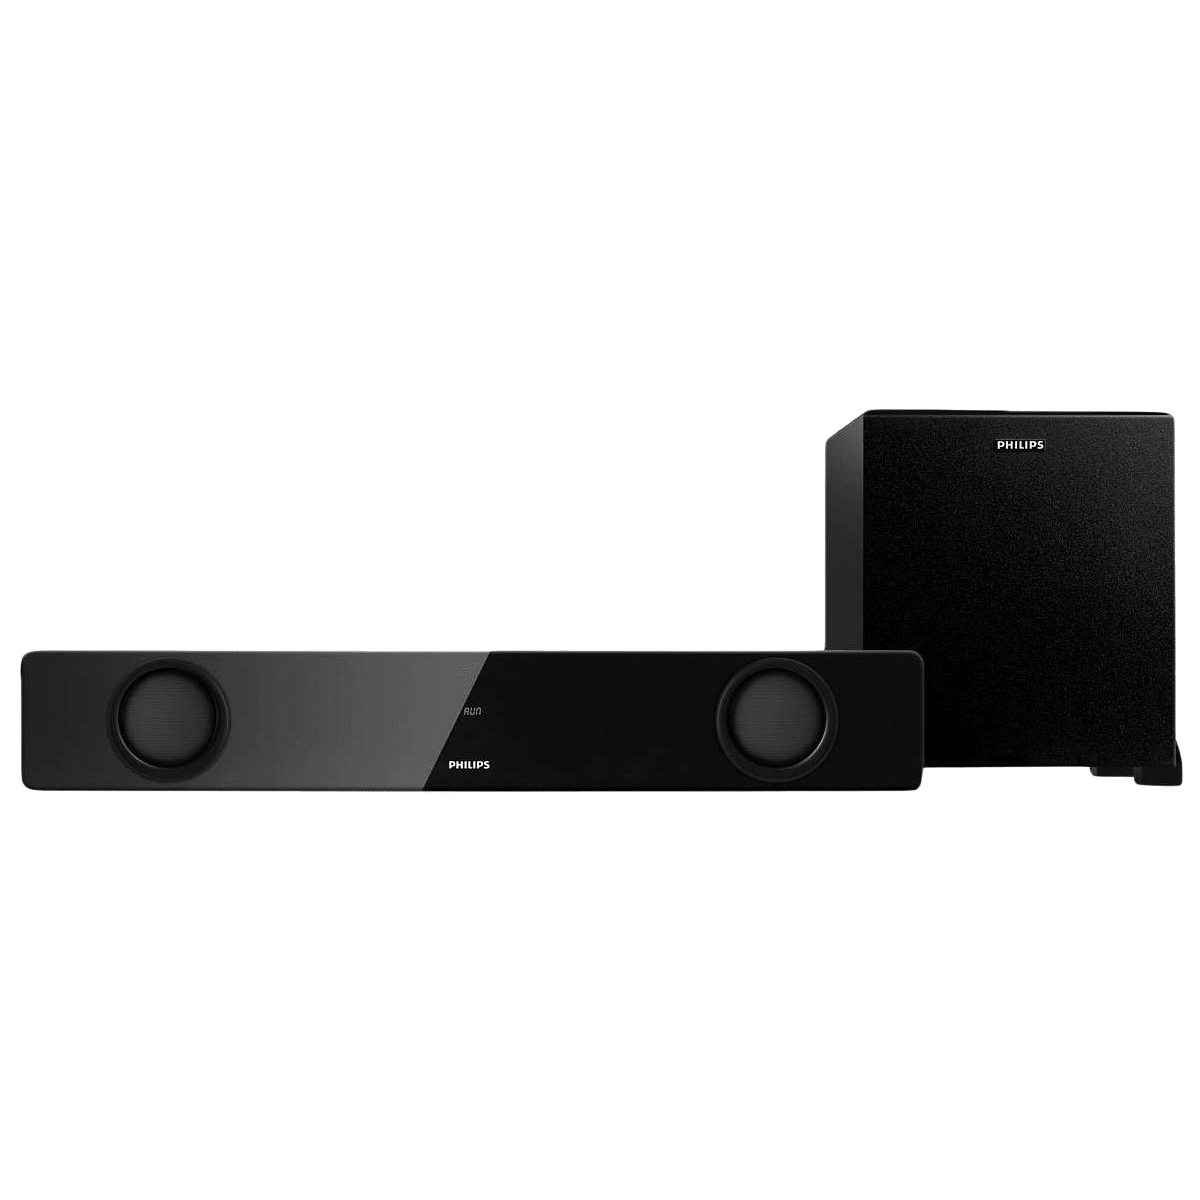 Philips 2.1 Channel 40 Watts SoundBar (Smart Audio Equalizer, HTL1041, Black)